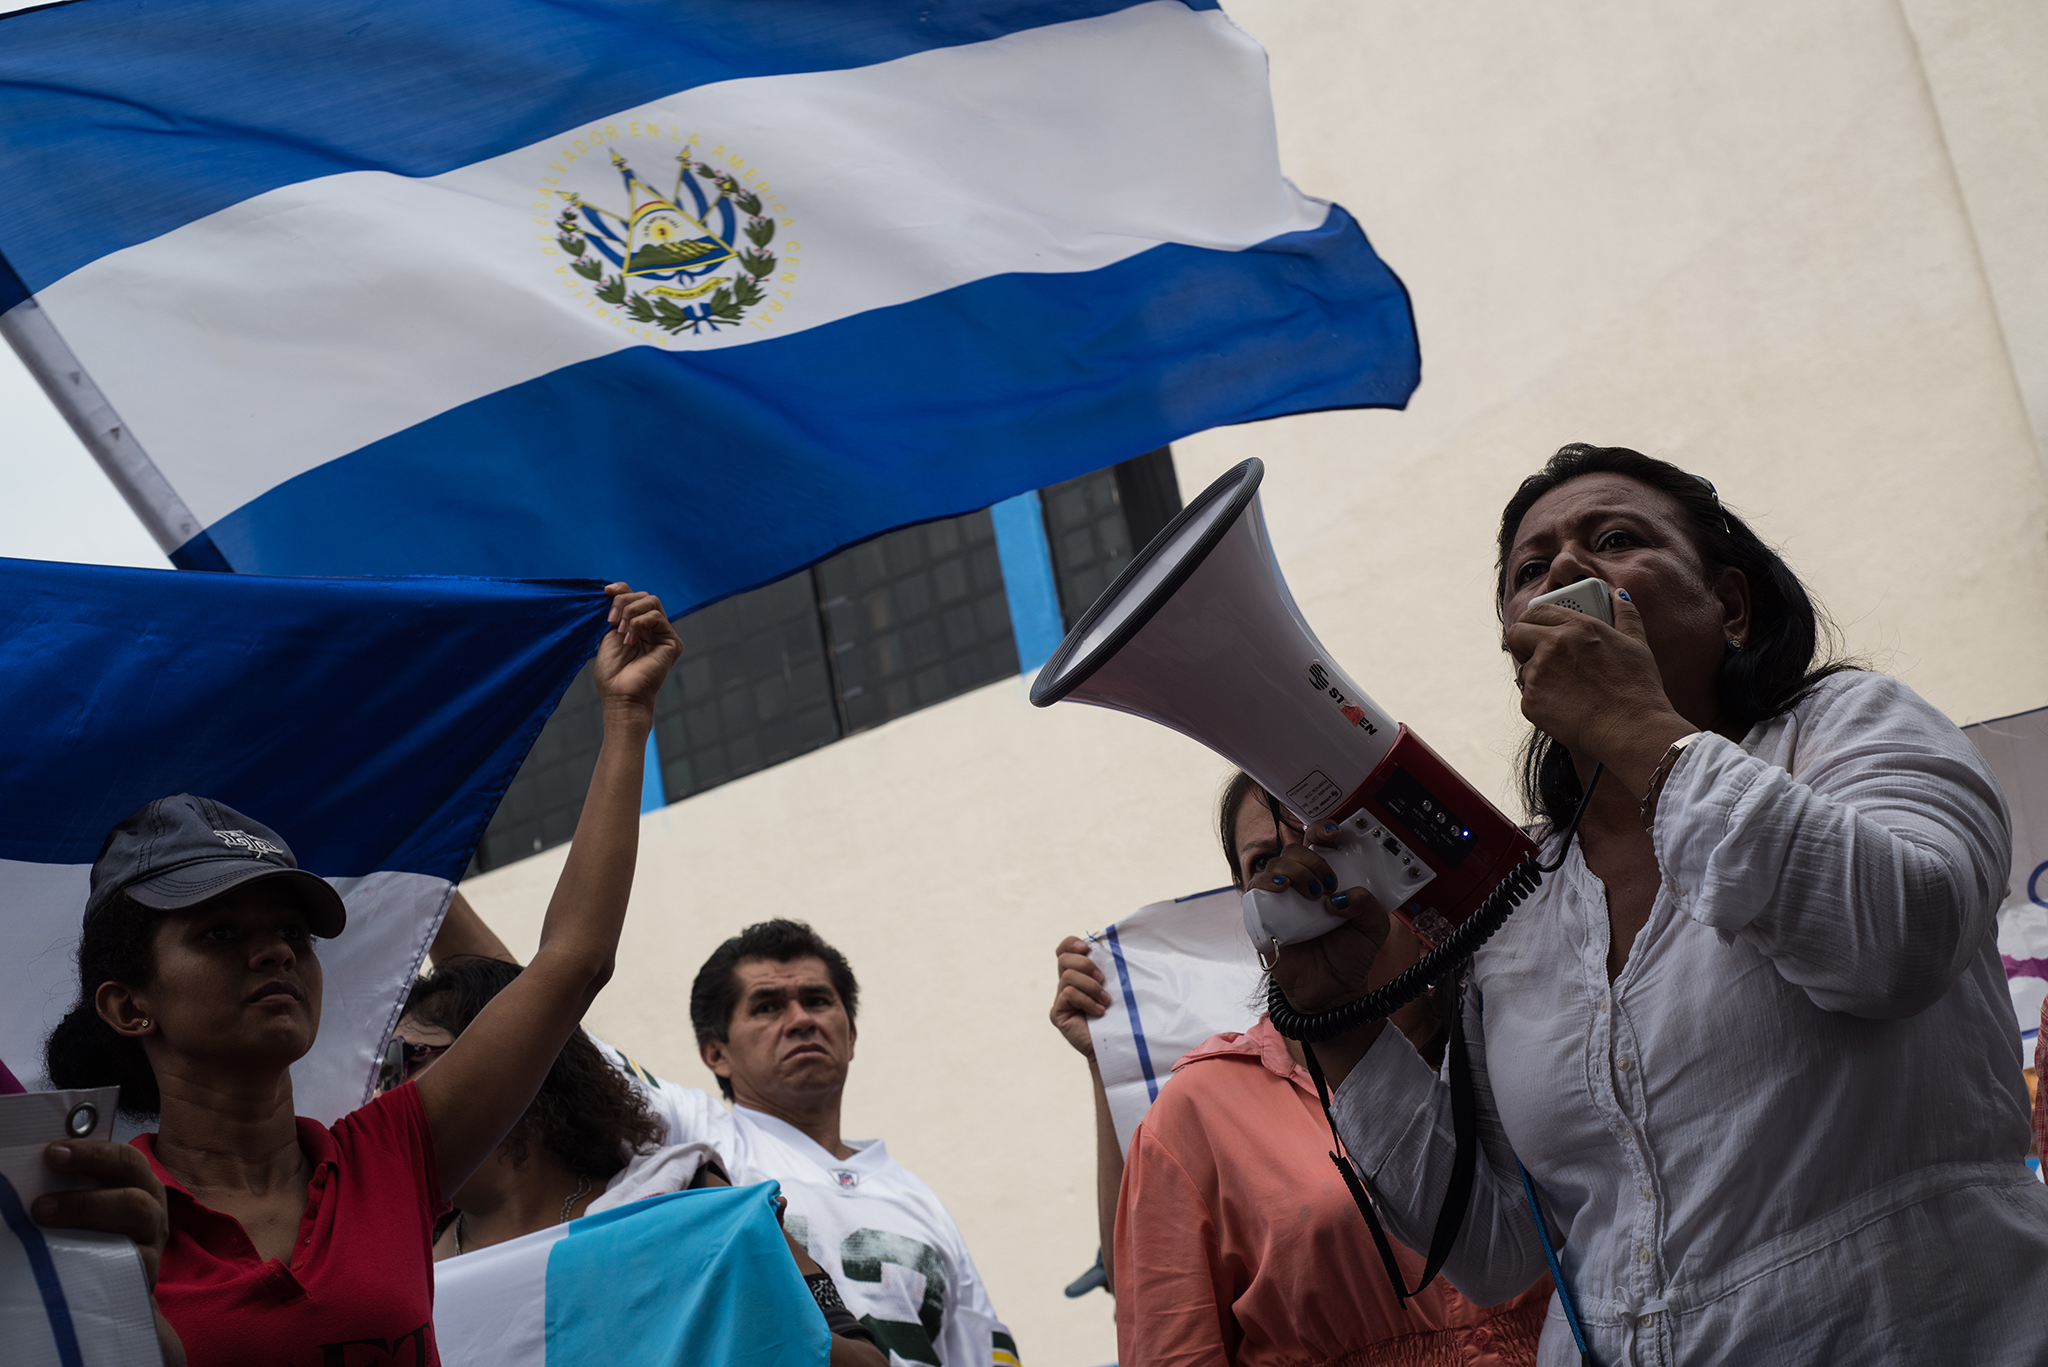 Viacrucis de refugiados migrantes llega a Orizaba